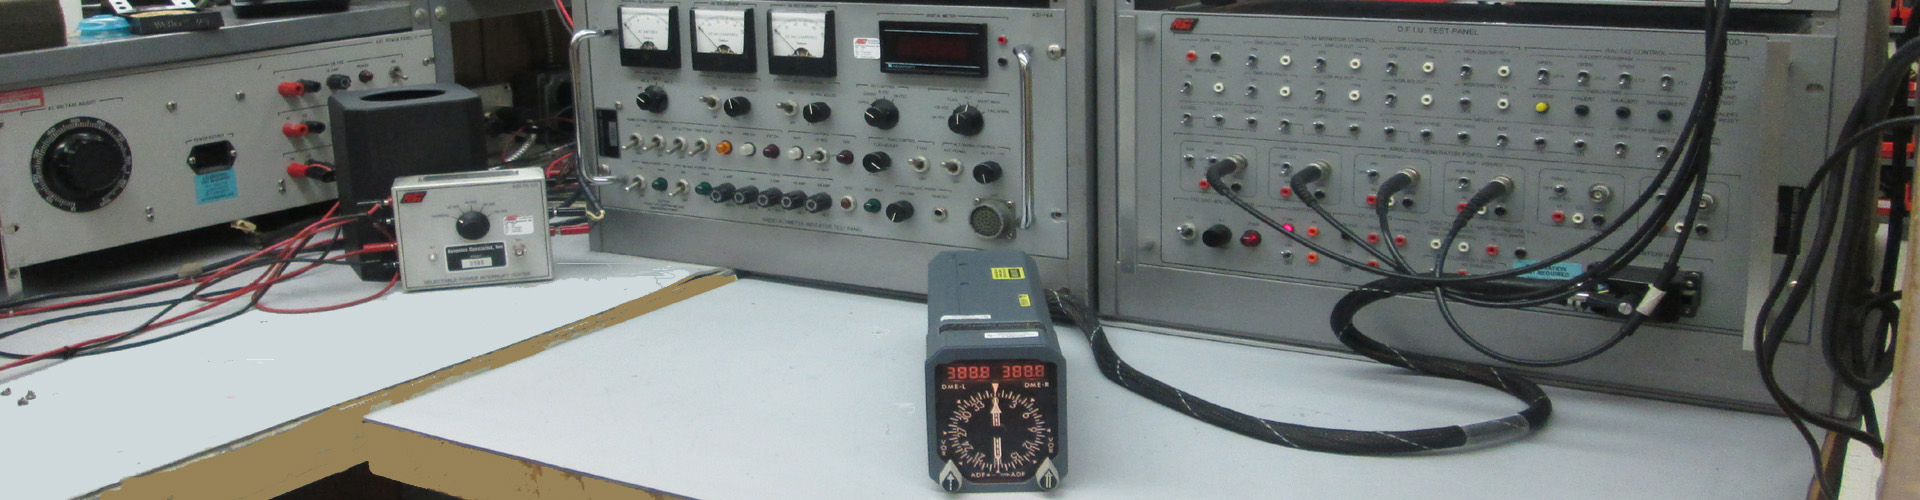 Avionics Specialist Inc Products Asi Test Equipment Wiring Harness Testing